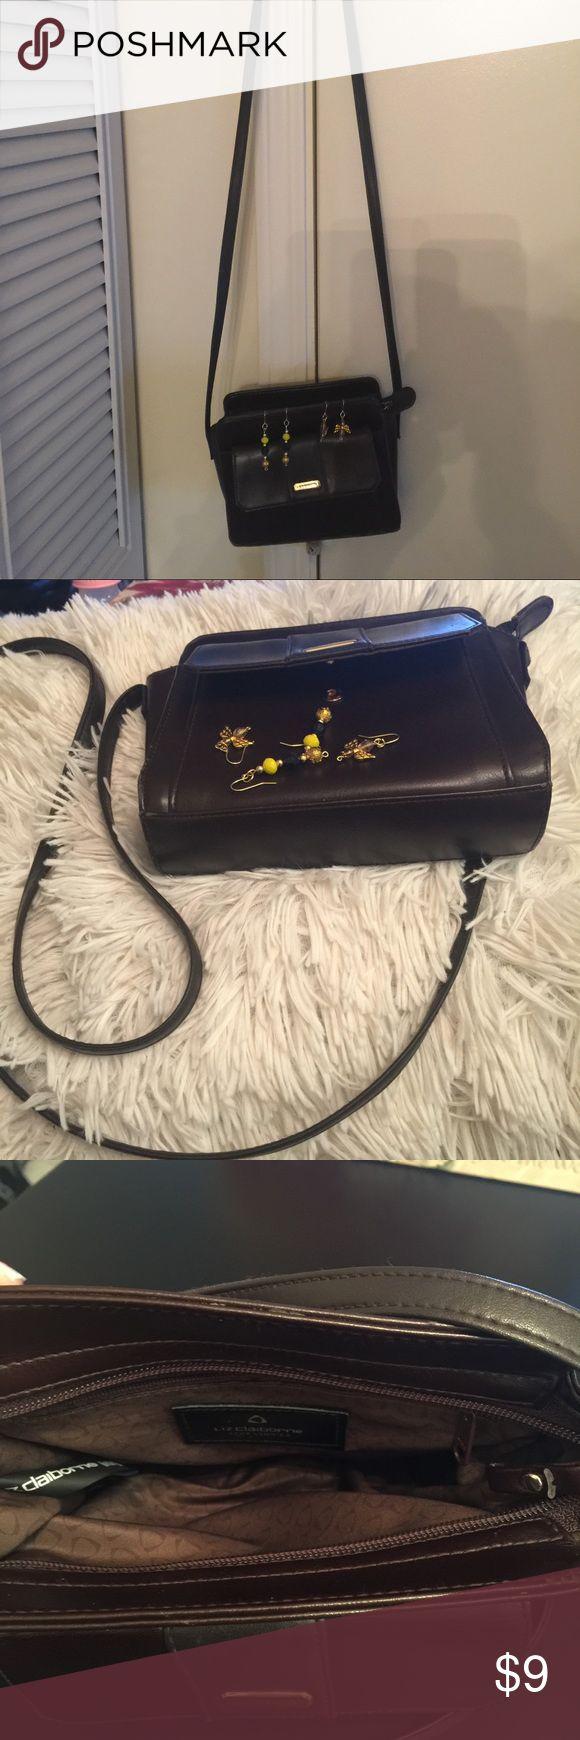 Liz Claiborne mini handbag Liz Claiborne mini bag with a long trap. There little tear  on the edge overall the condition is good. Liz Claiborne Bags Mini Bags